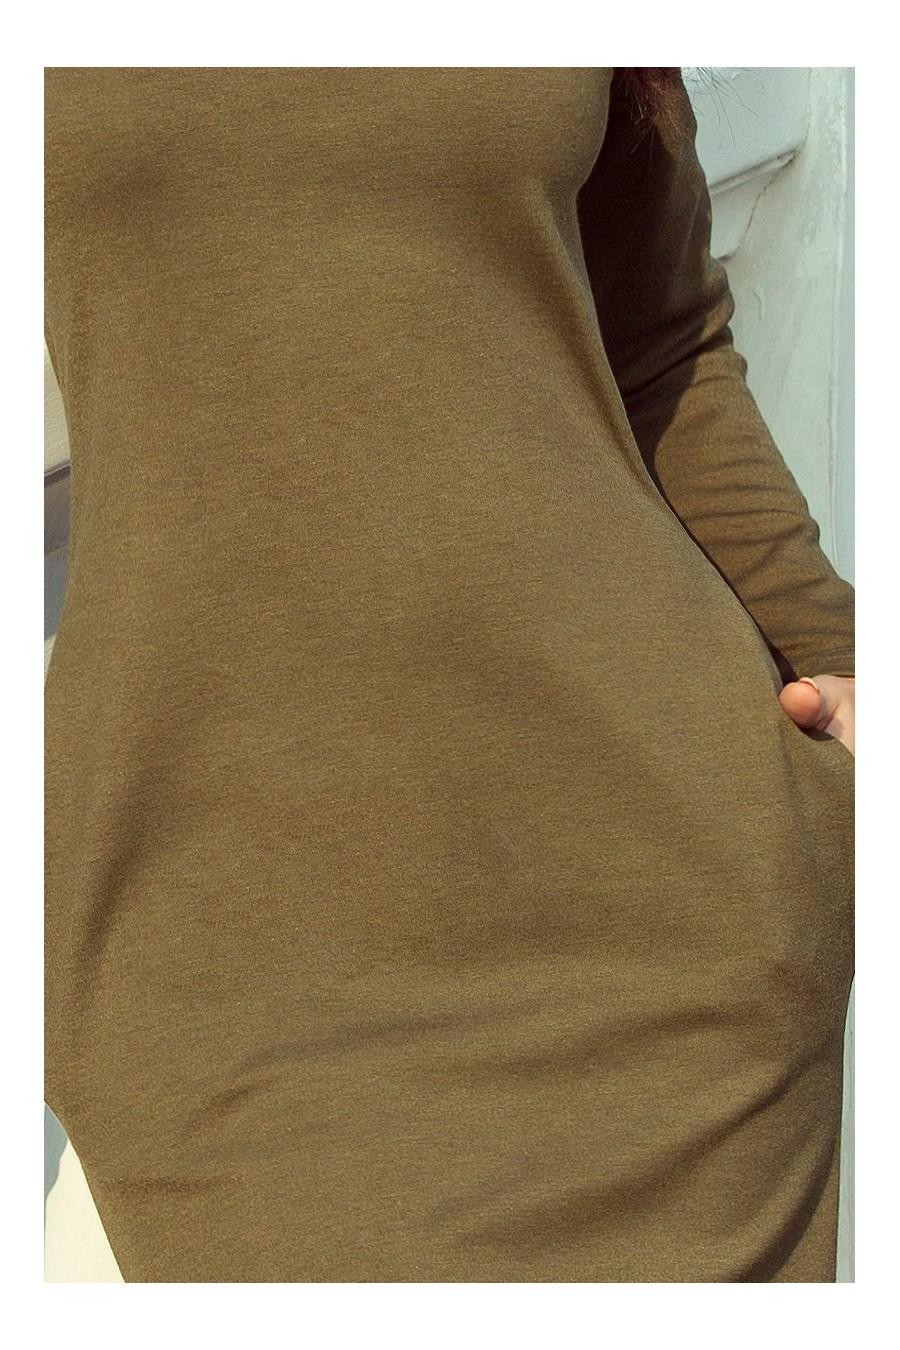 131-8 Šaty s velkým rolákem a kapsami - khaki barva